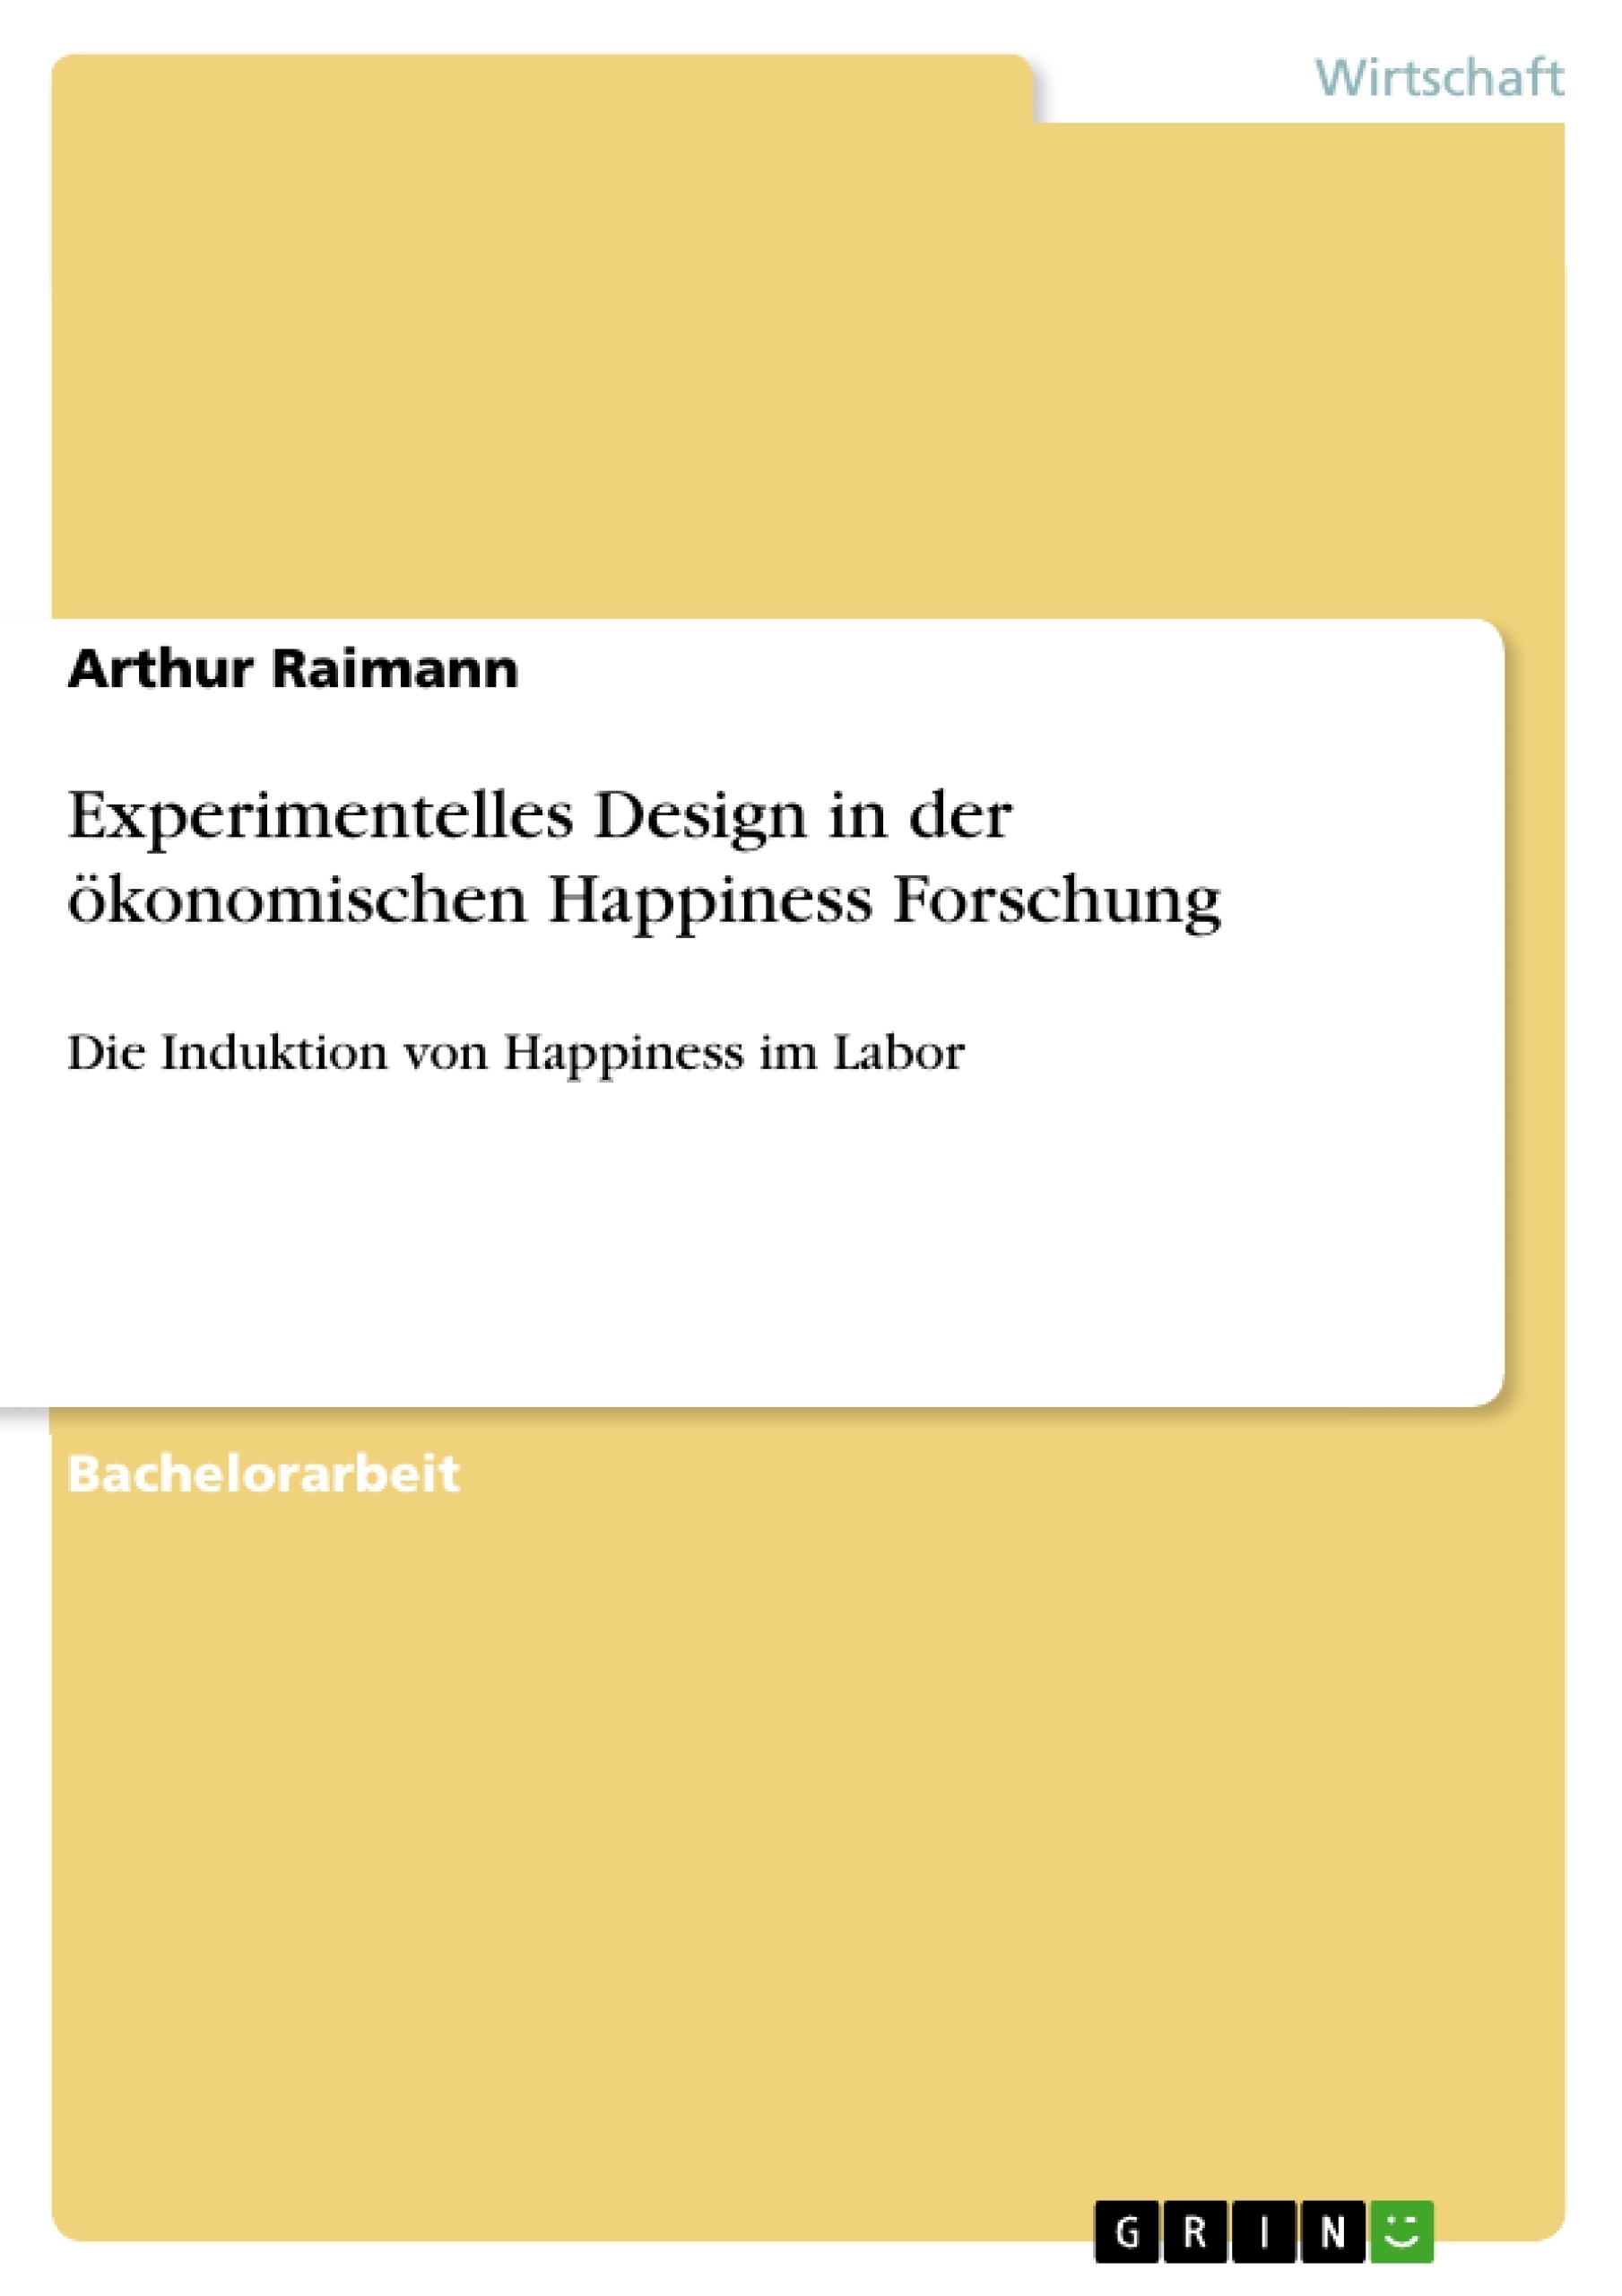 Titel: Experimentelles Design in der ökonomischen Happiness Forschung